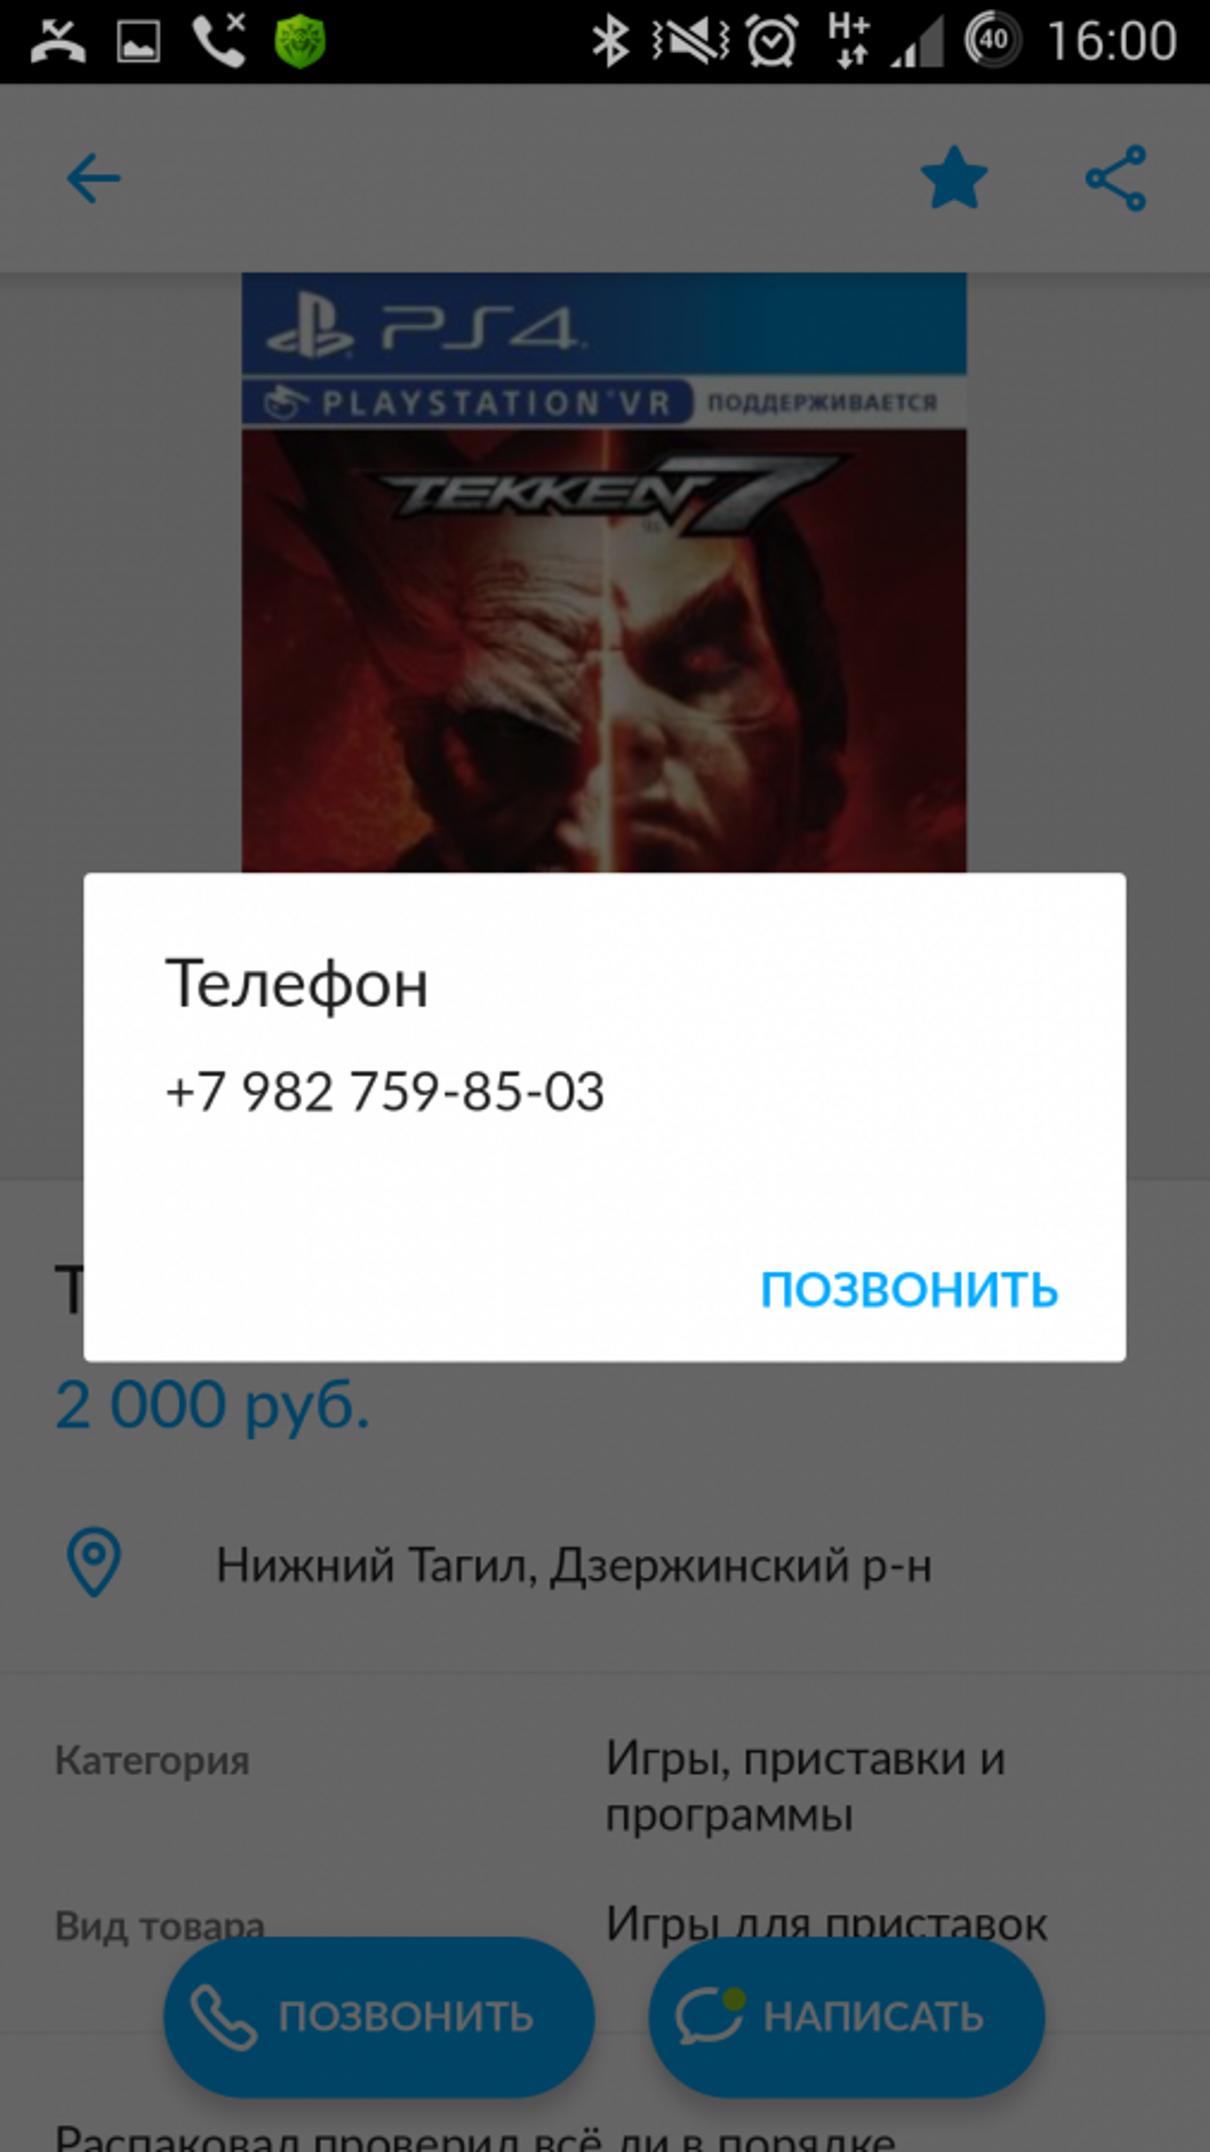 Жалоба-отзыв: Богдан - Не поиграл на PS4.  Фото №2